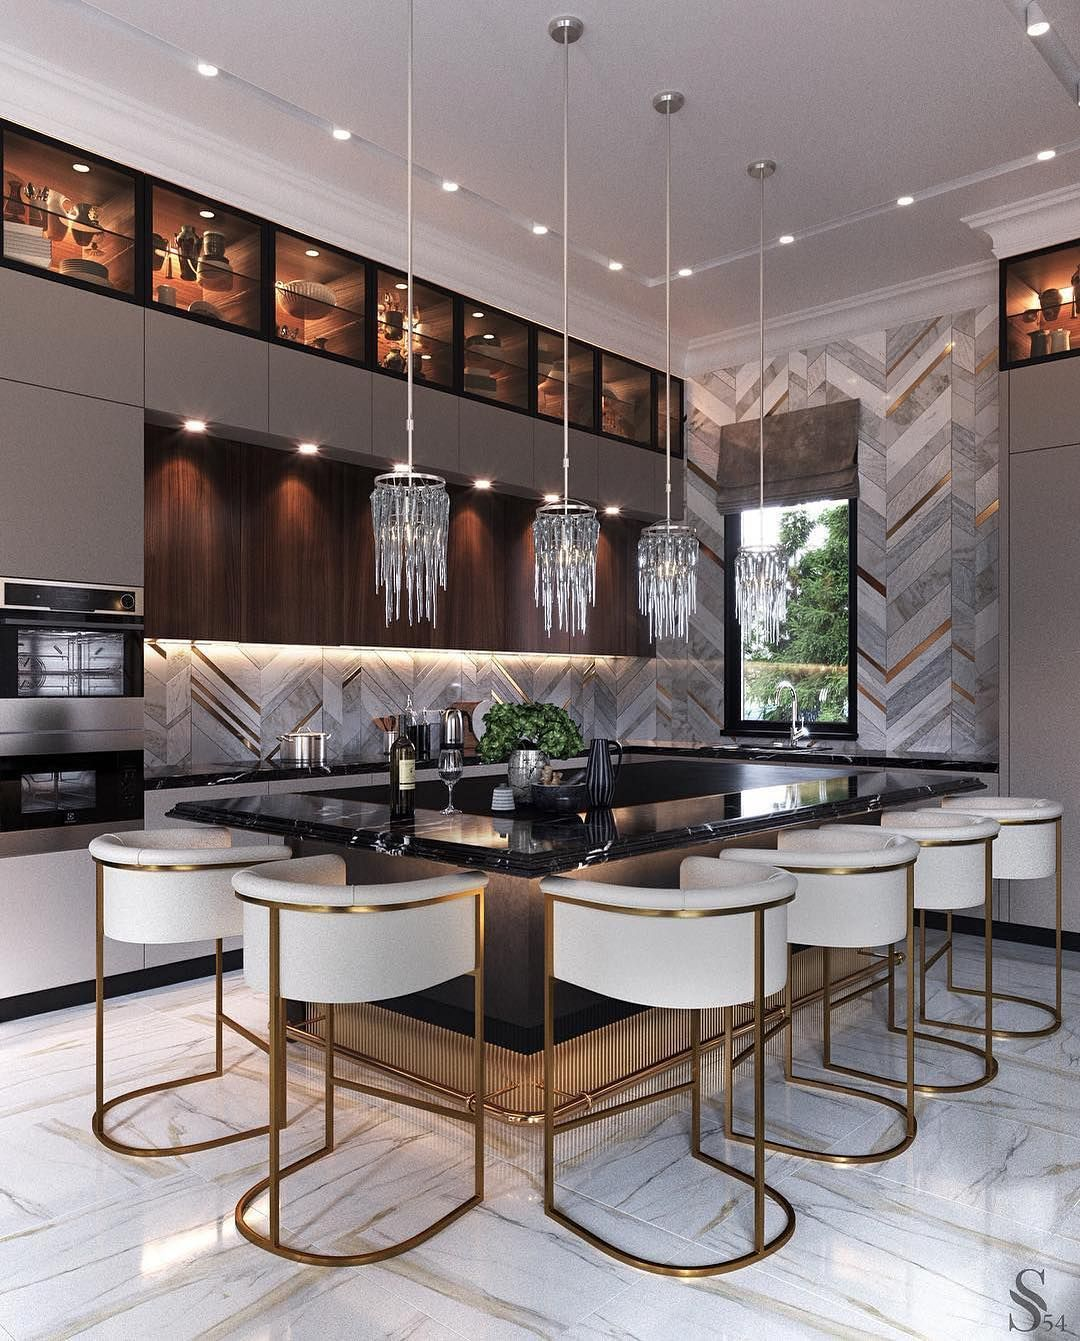 The Luxury Interior S Instagram Post This Is Definitely Kitchen